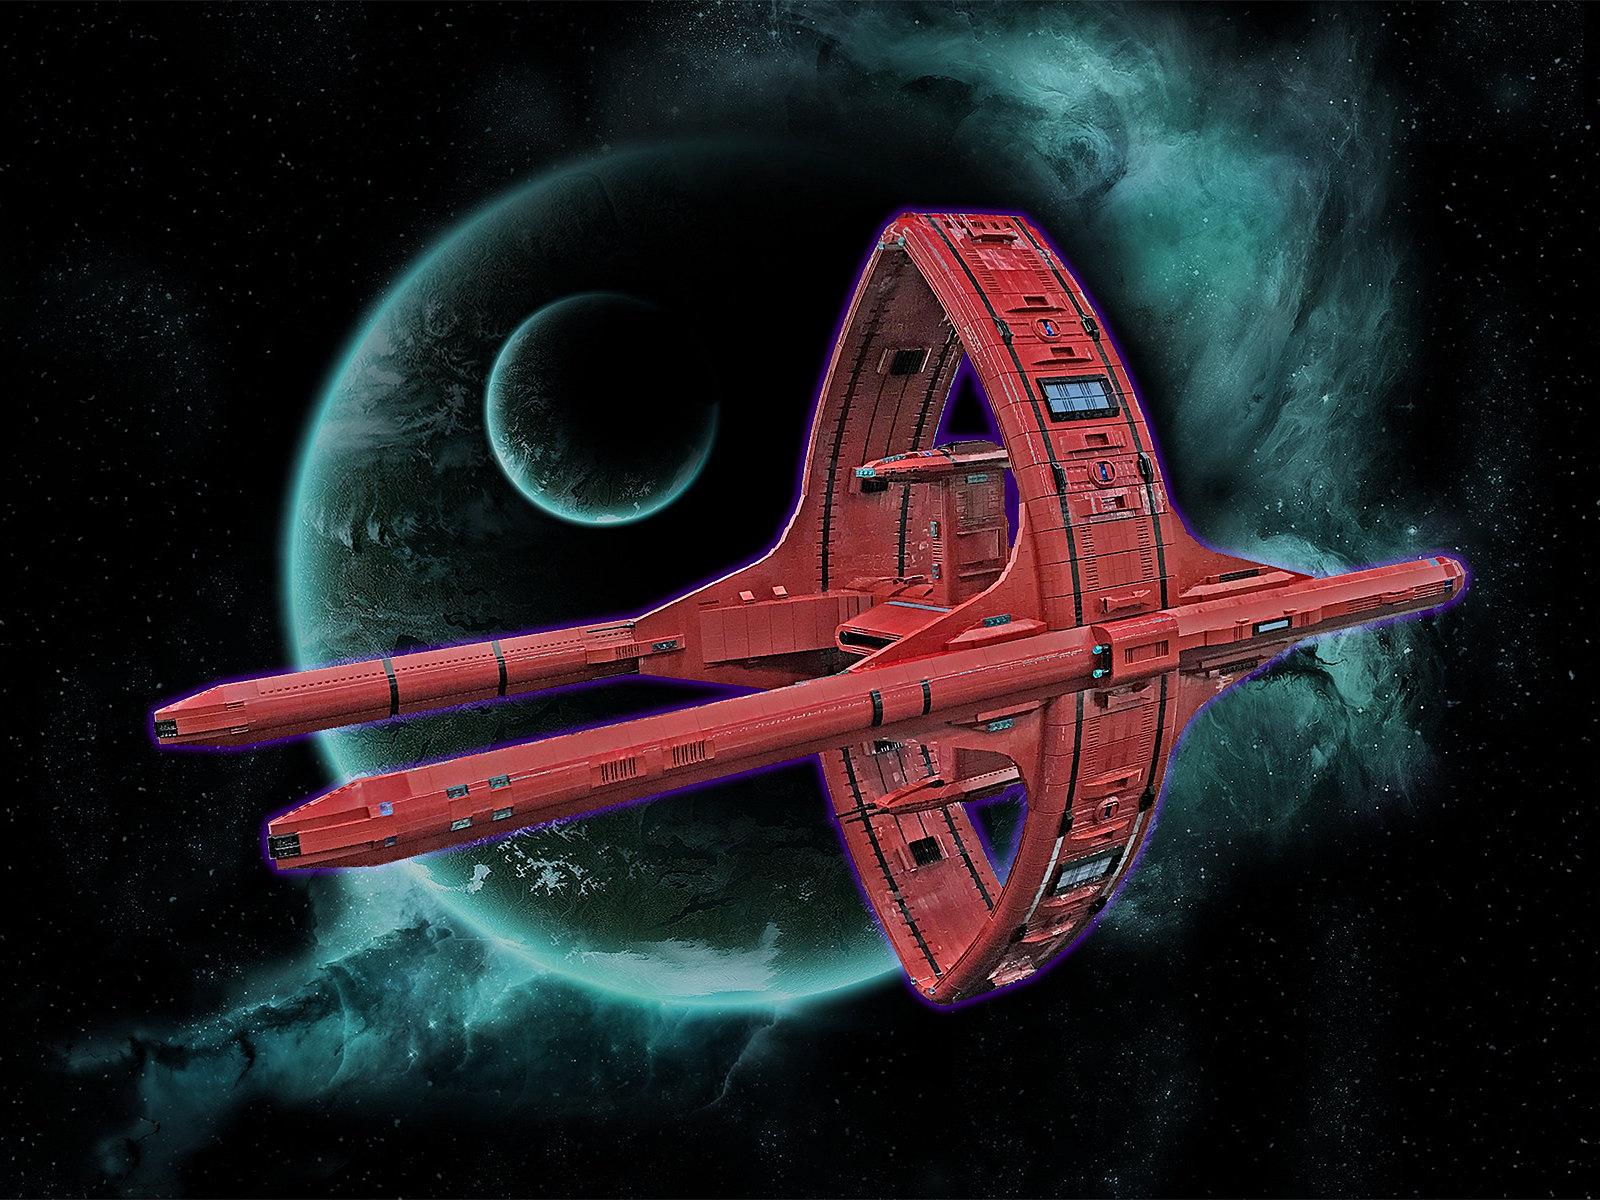 spaceship space LEGO